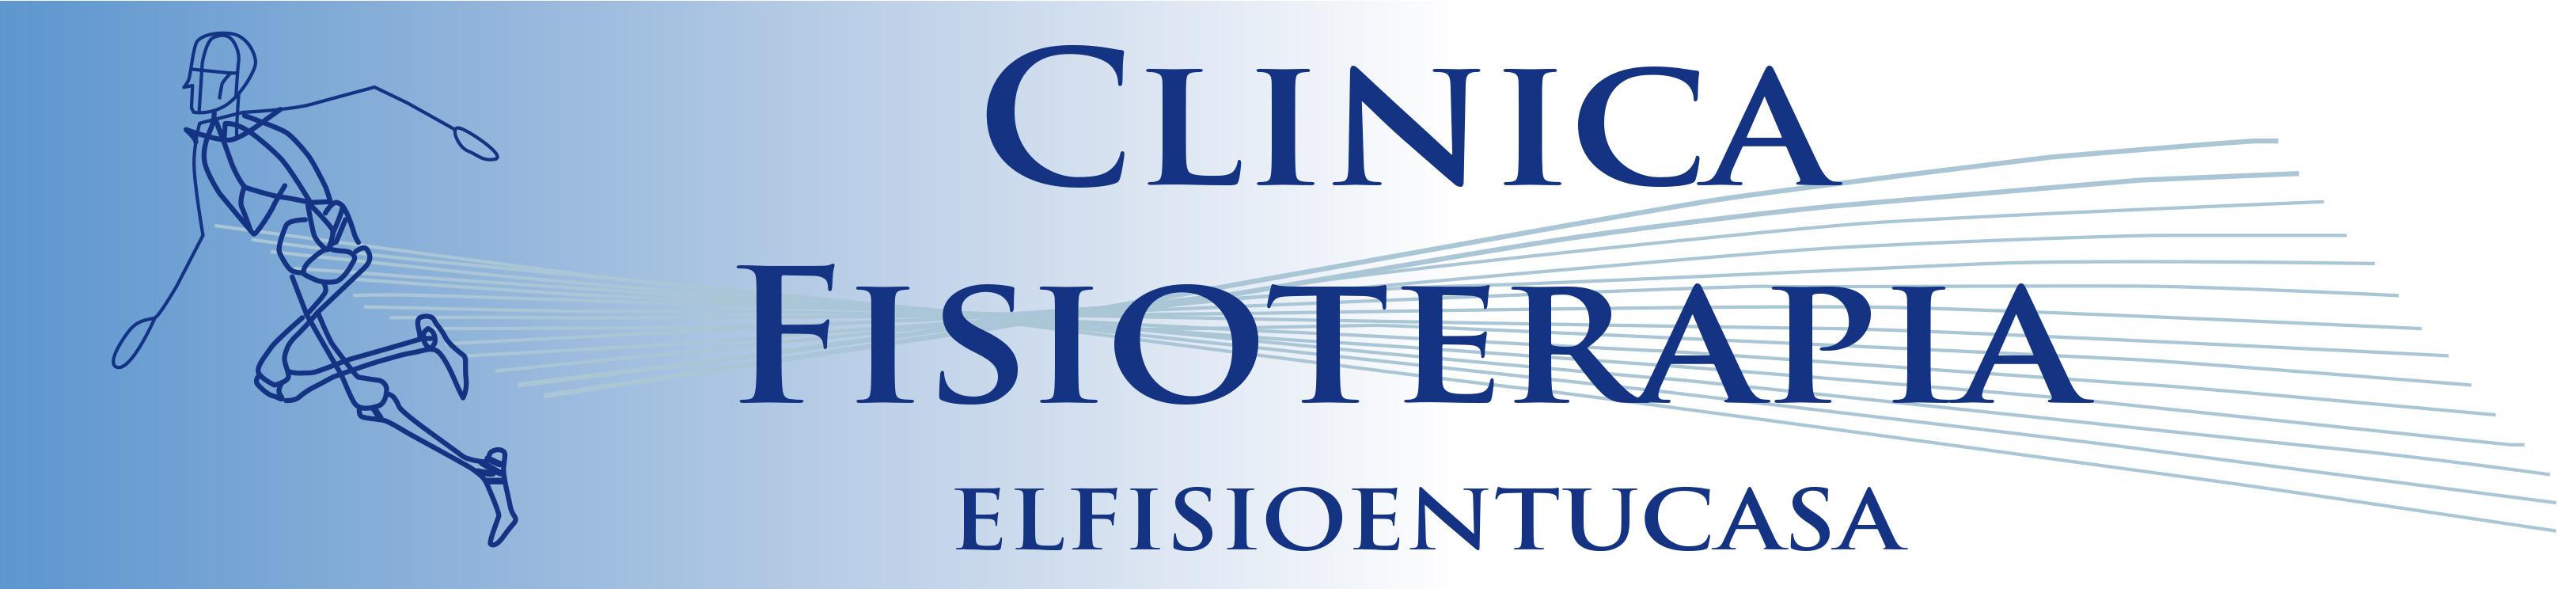 Clinica de fisioterapia Costaballena